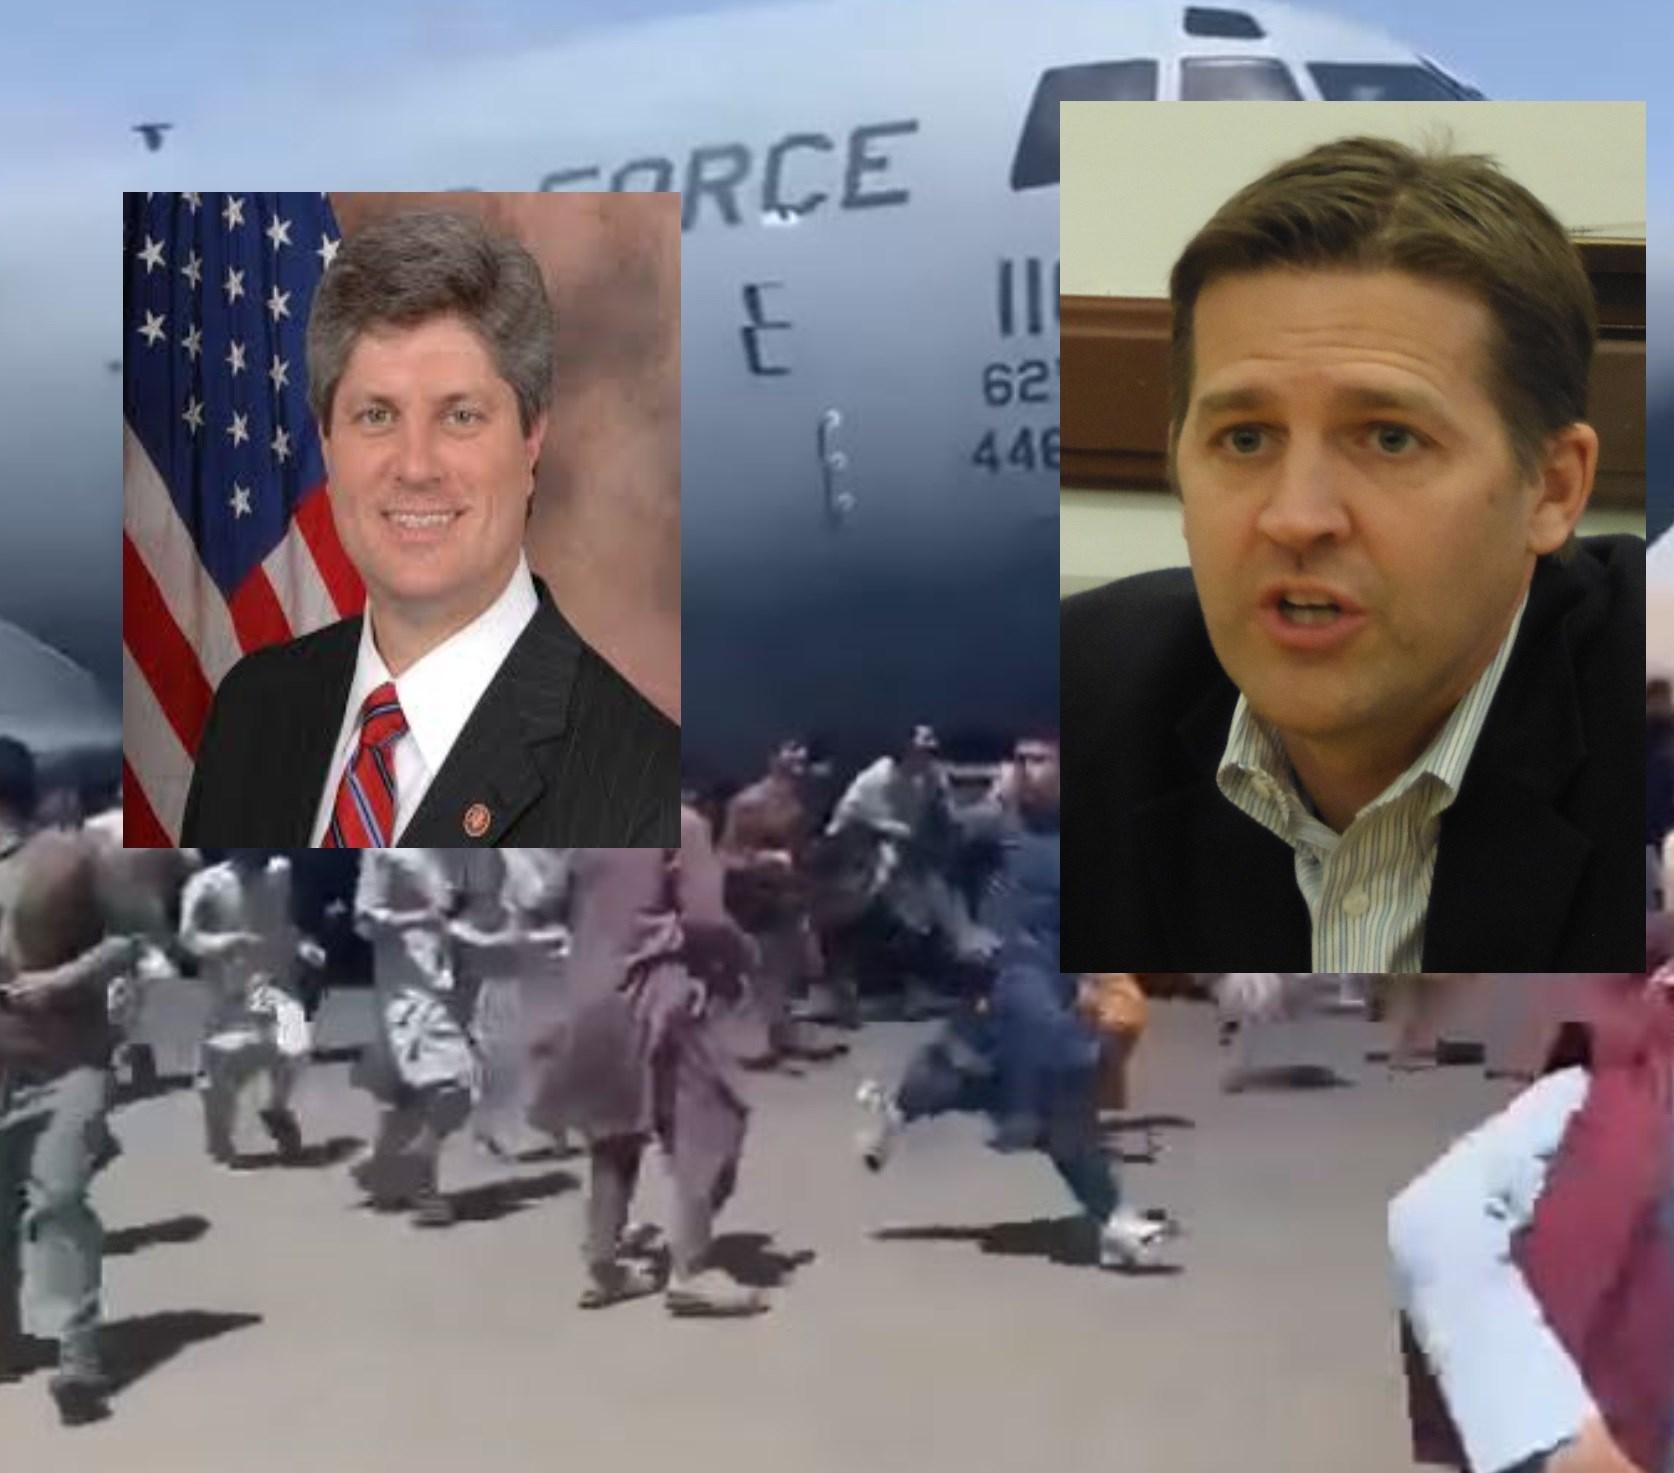 Nebraskans react to Afghanistan situation